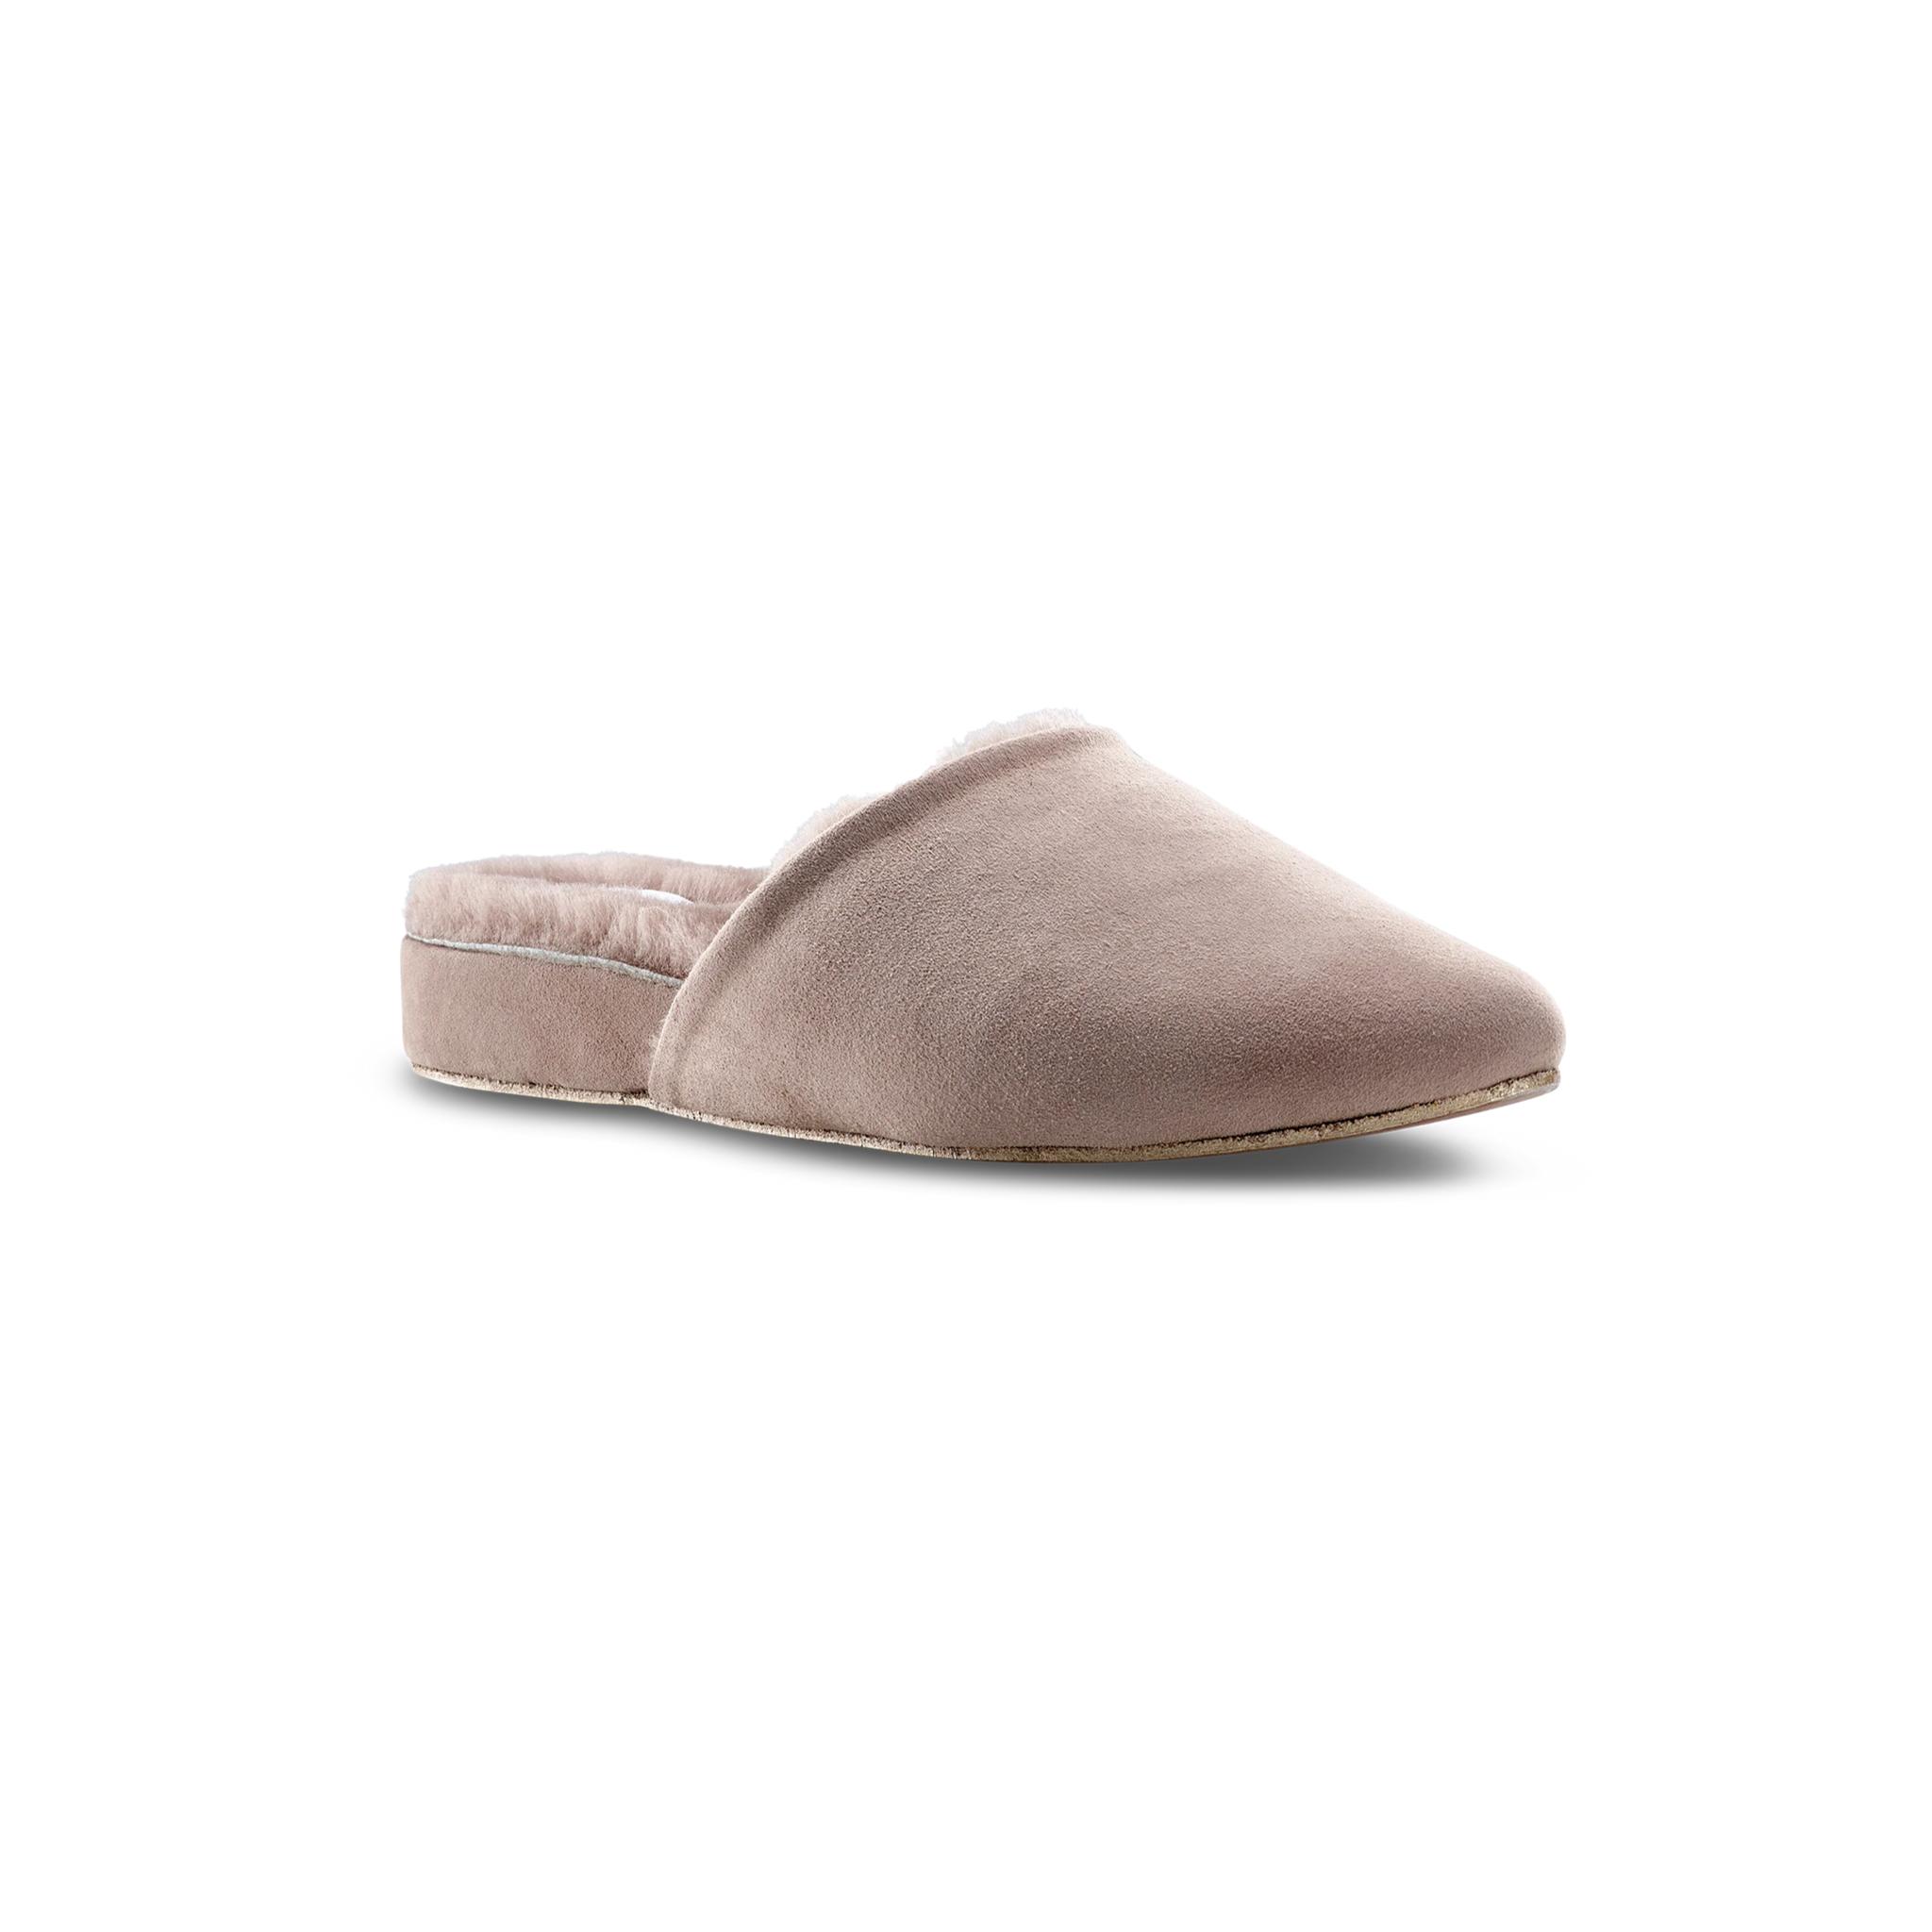 Ross & Snow Julia Desert Rose Shearling Lined Slipper - Discount Italian Shoes